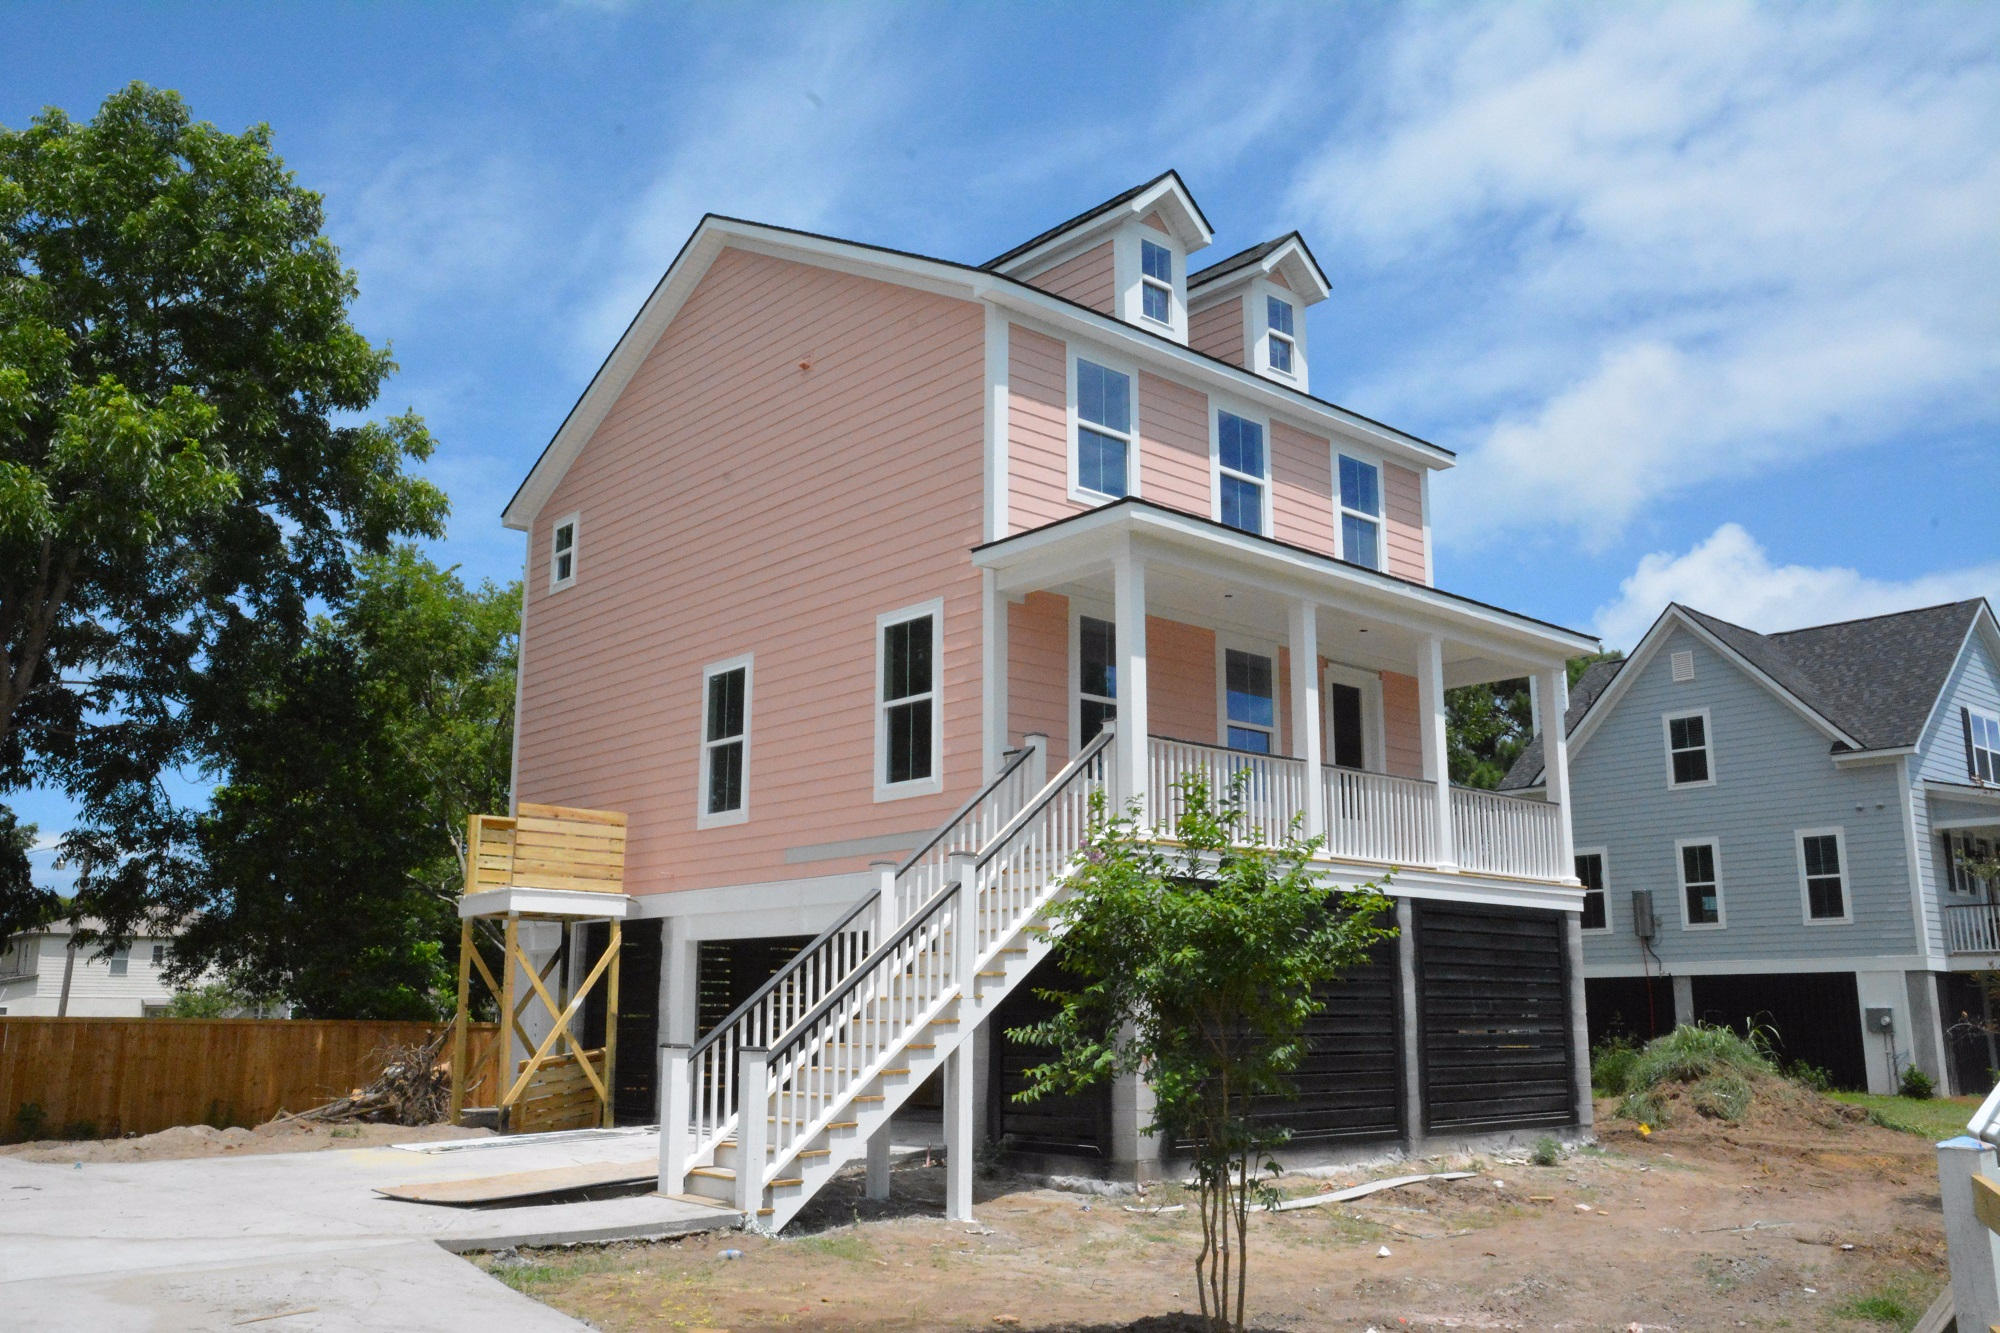 Property for sale at 1838 Scudder Rd, James Island,  South Carolina 29412